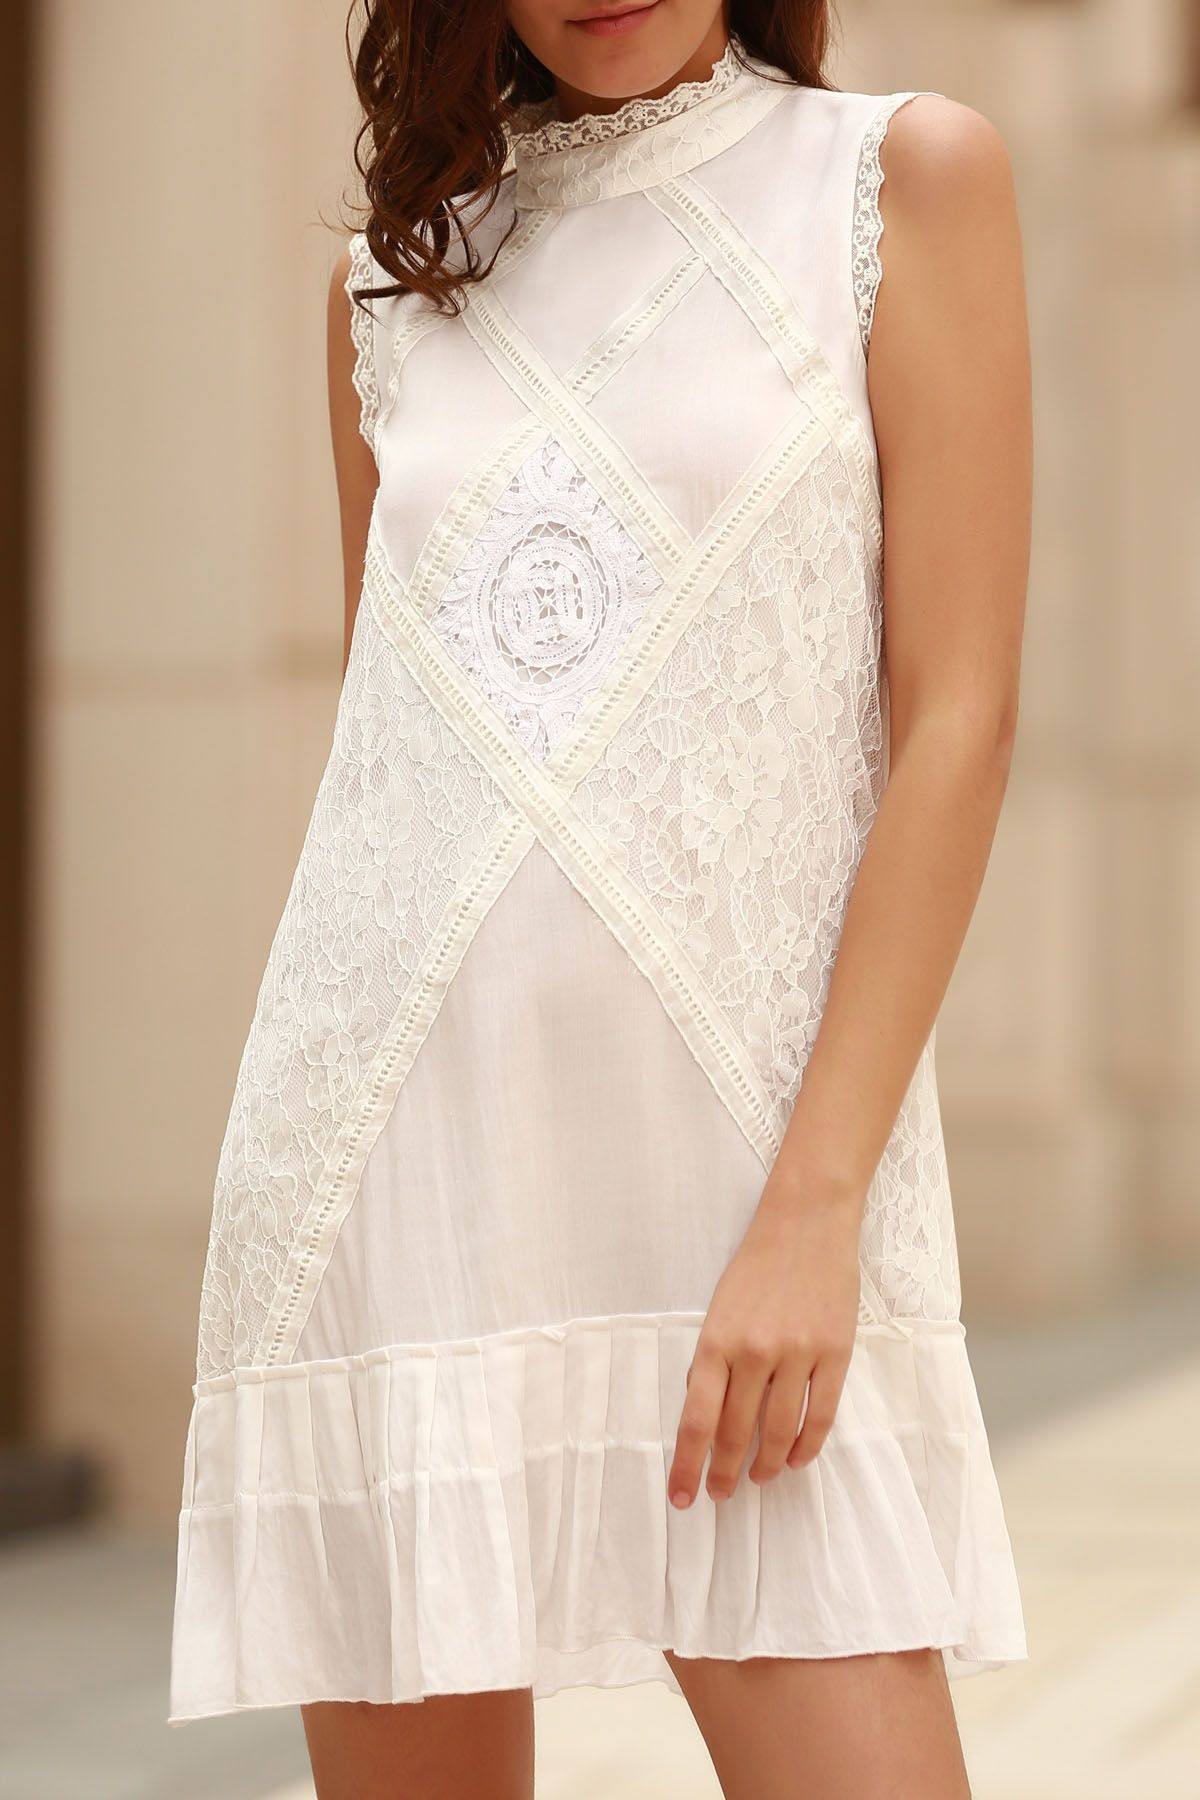 2d0042093 Lace Splice Round Neck Sleeveless Dress WHITE  Dresses 2016